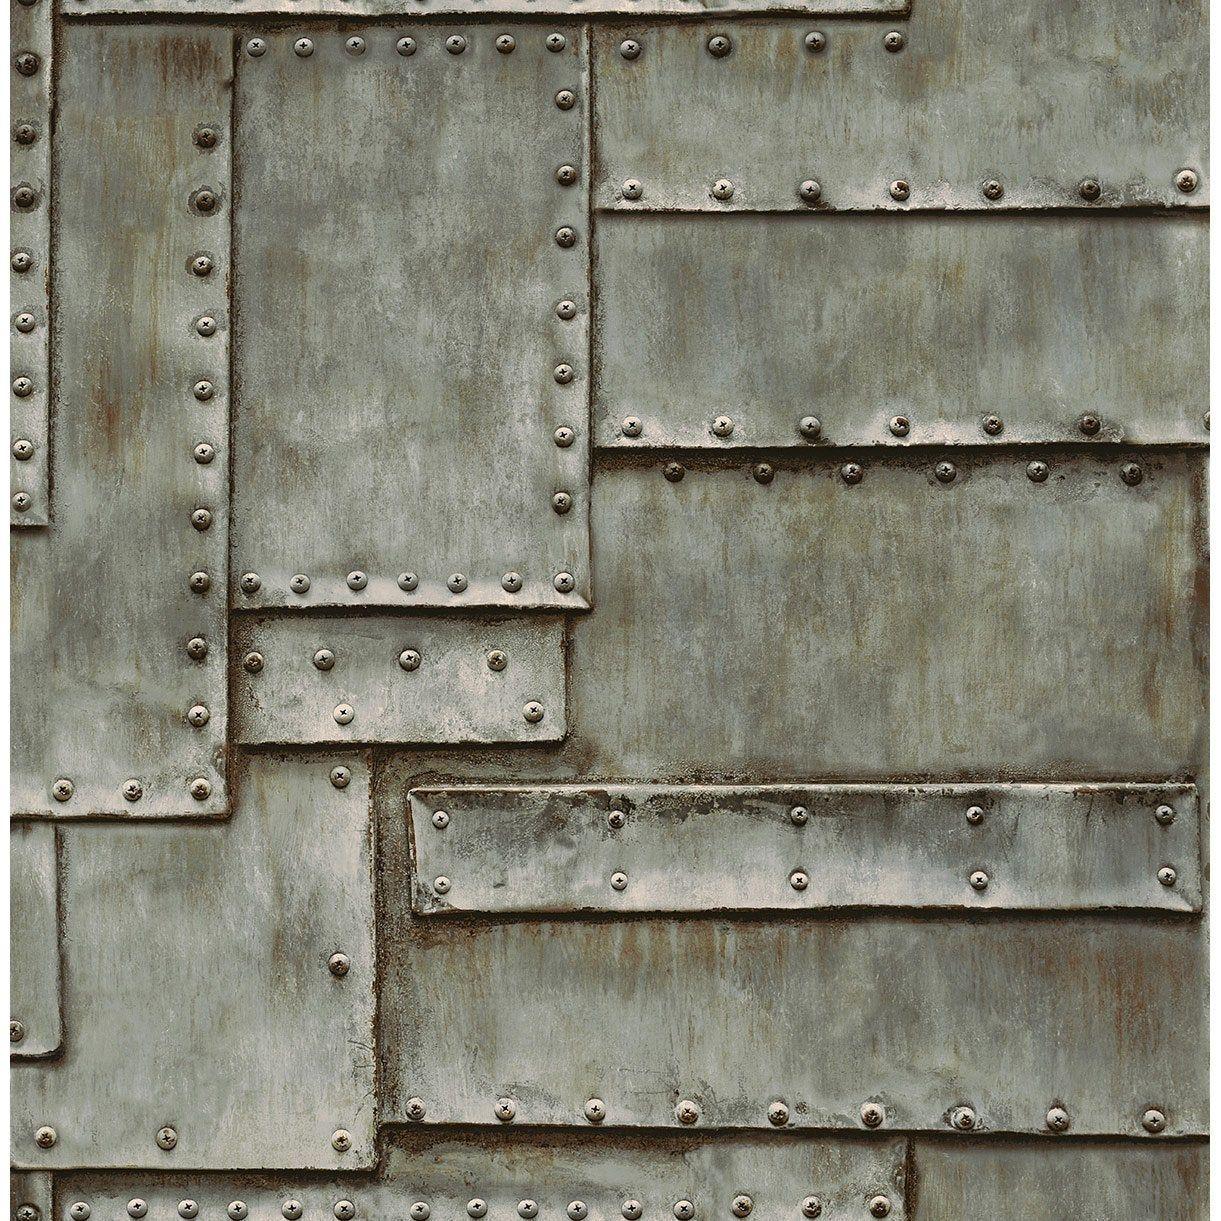 Papier Peint Vinyle 3d Patch De Tole Gris V 2020 G Metallicheskie Oboi List Metalla Tekstury Kraski